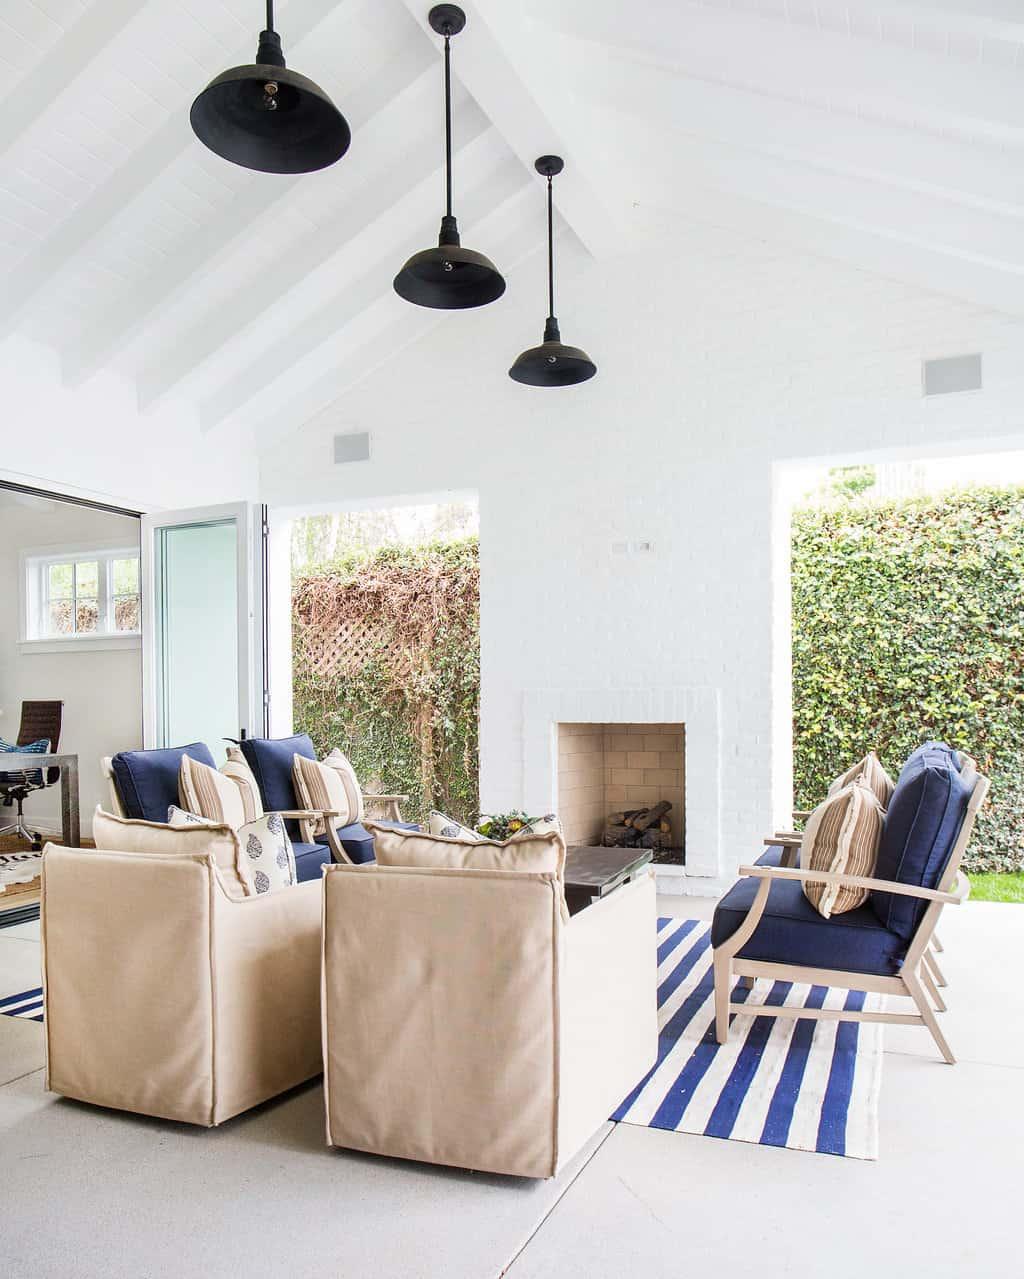 HOM-Modern-Farmhouse-With-Coastal-Flare-by-Blackband-Design-open-air